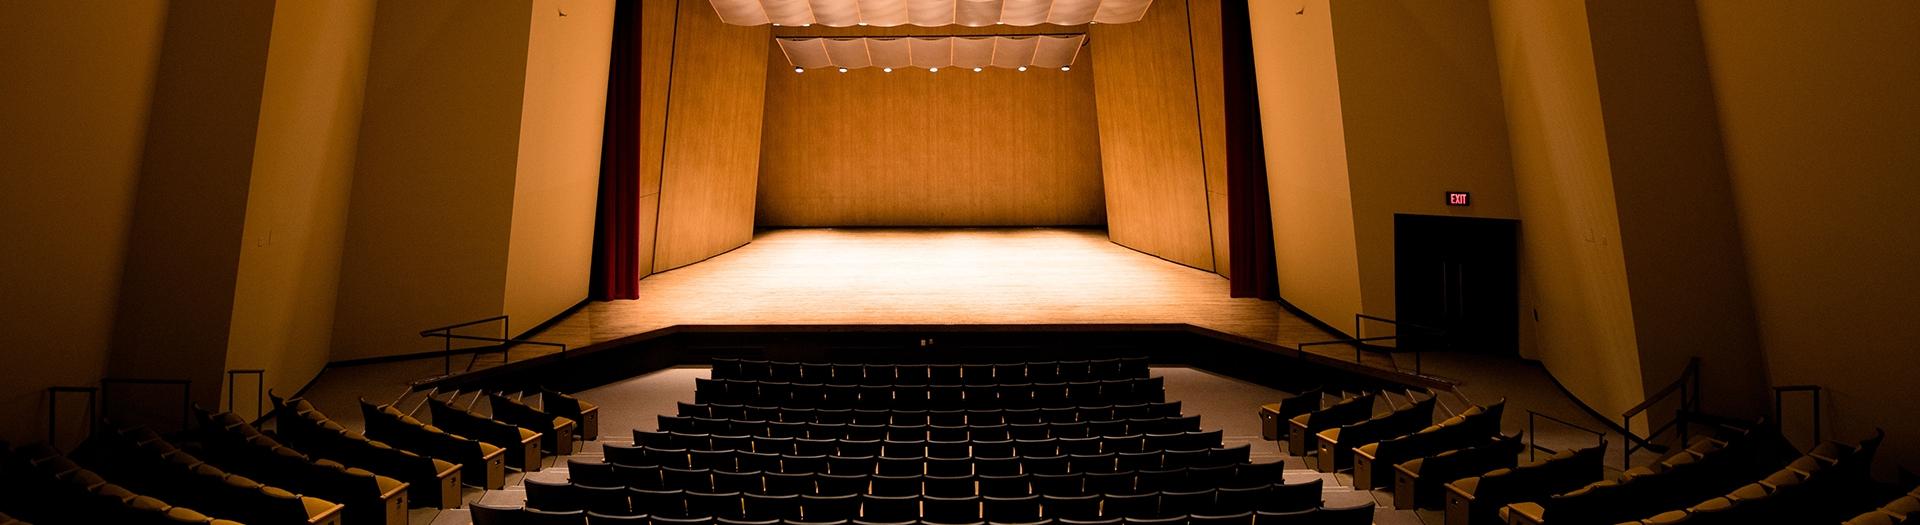 top_scfa_recital_hall_1920.jpg